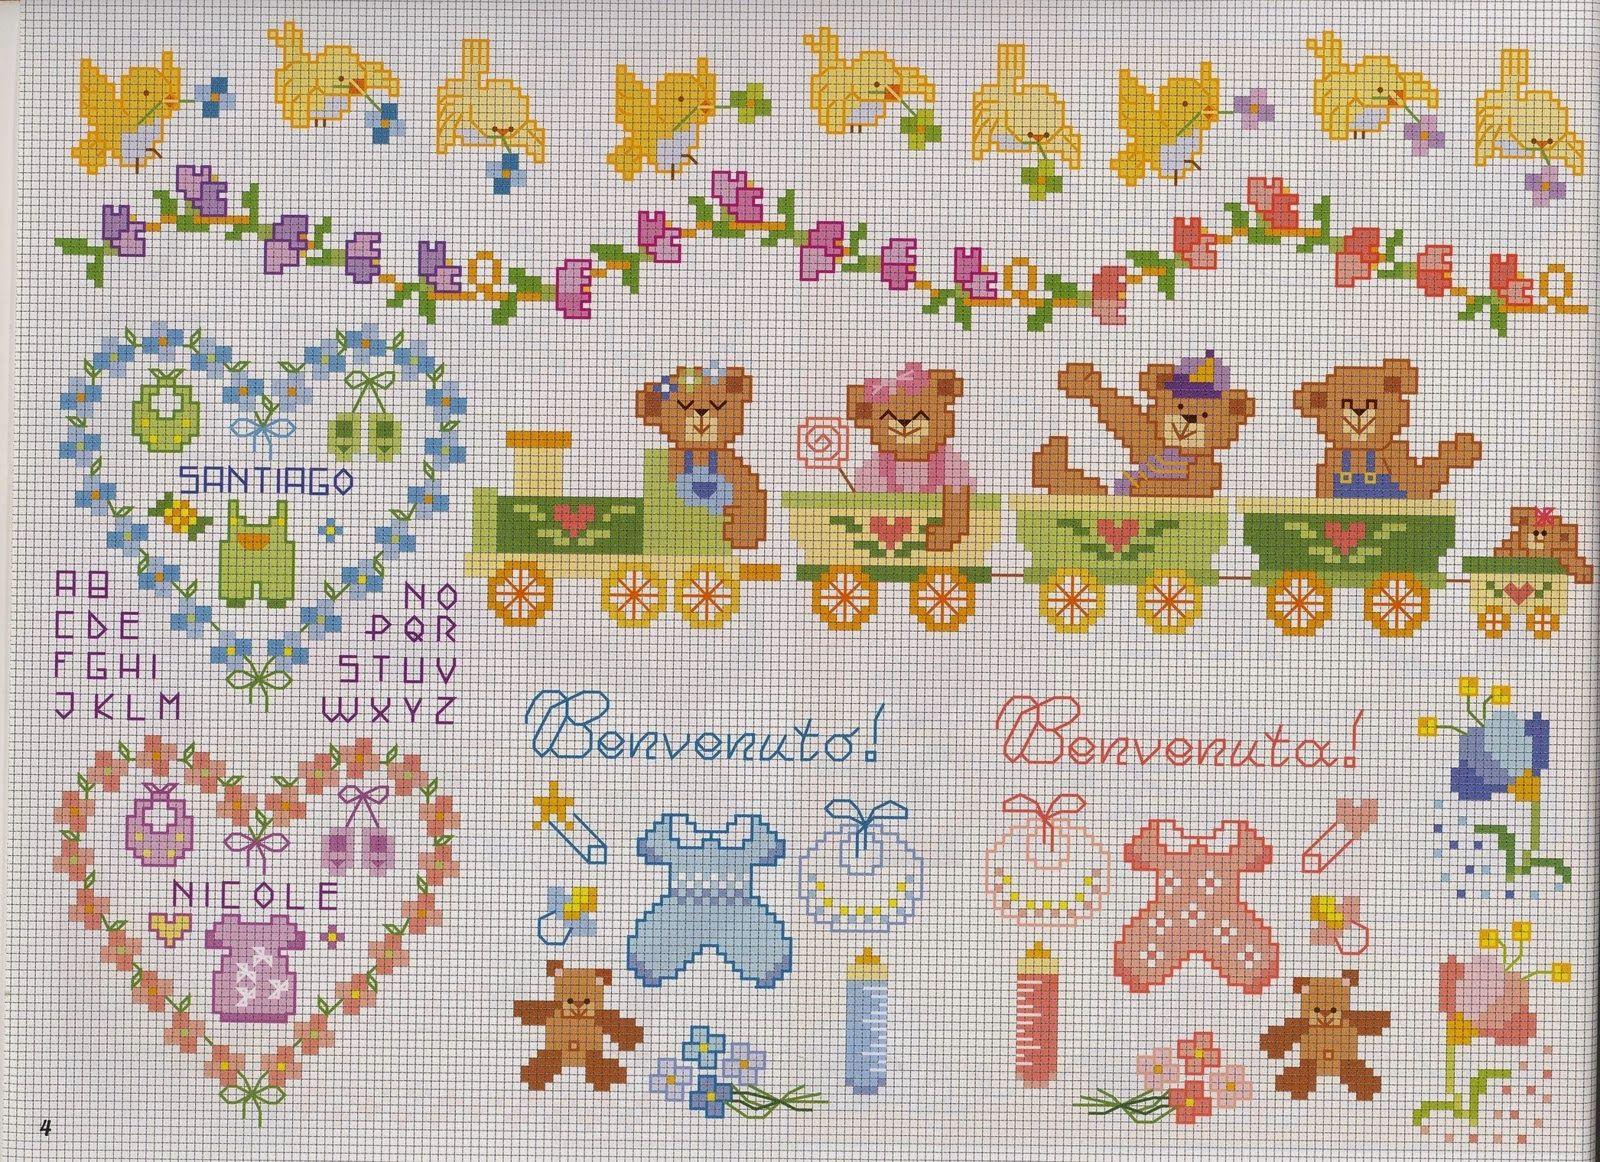 Punto croce schemi gratis e tutorial schemi punto croce for Disegni punto croce per lenzuolini neonati